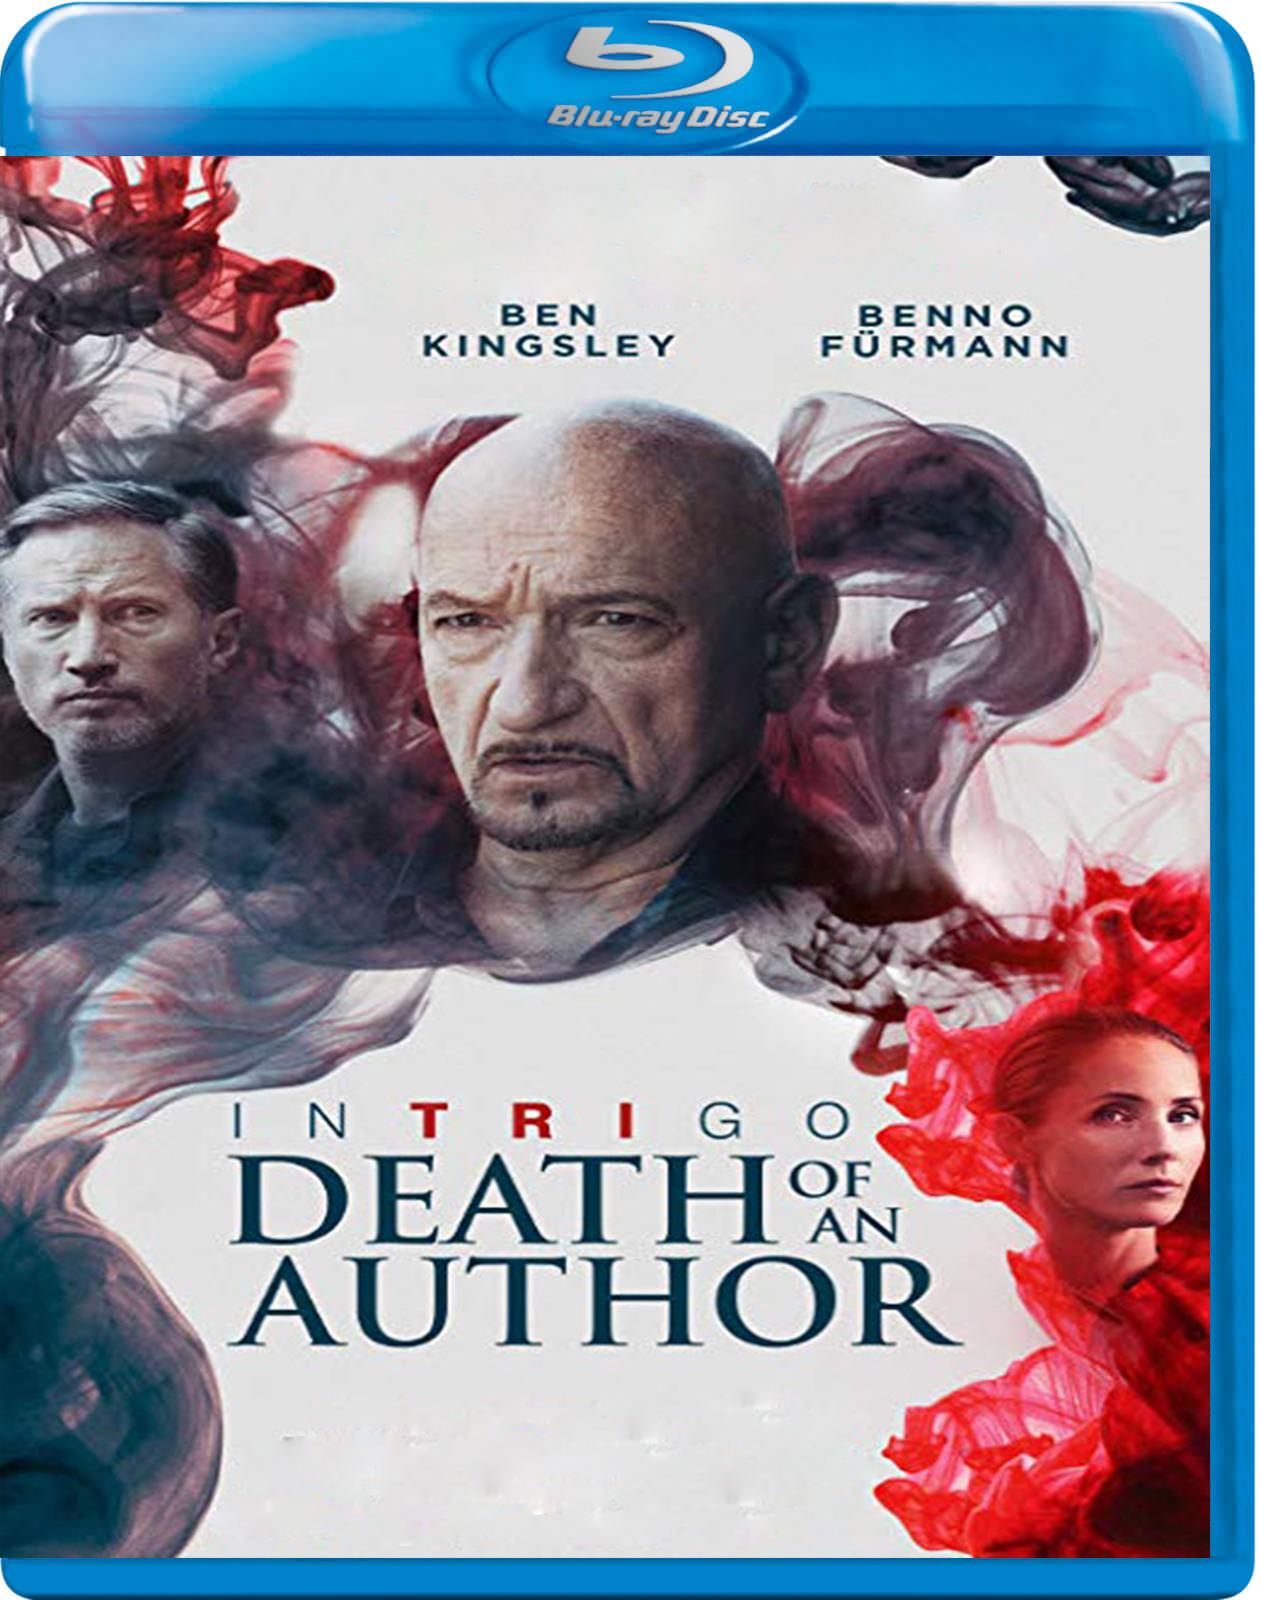 Intrigo: Tod eines autors [2018] [BD25] [Subtitulado]